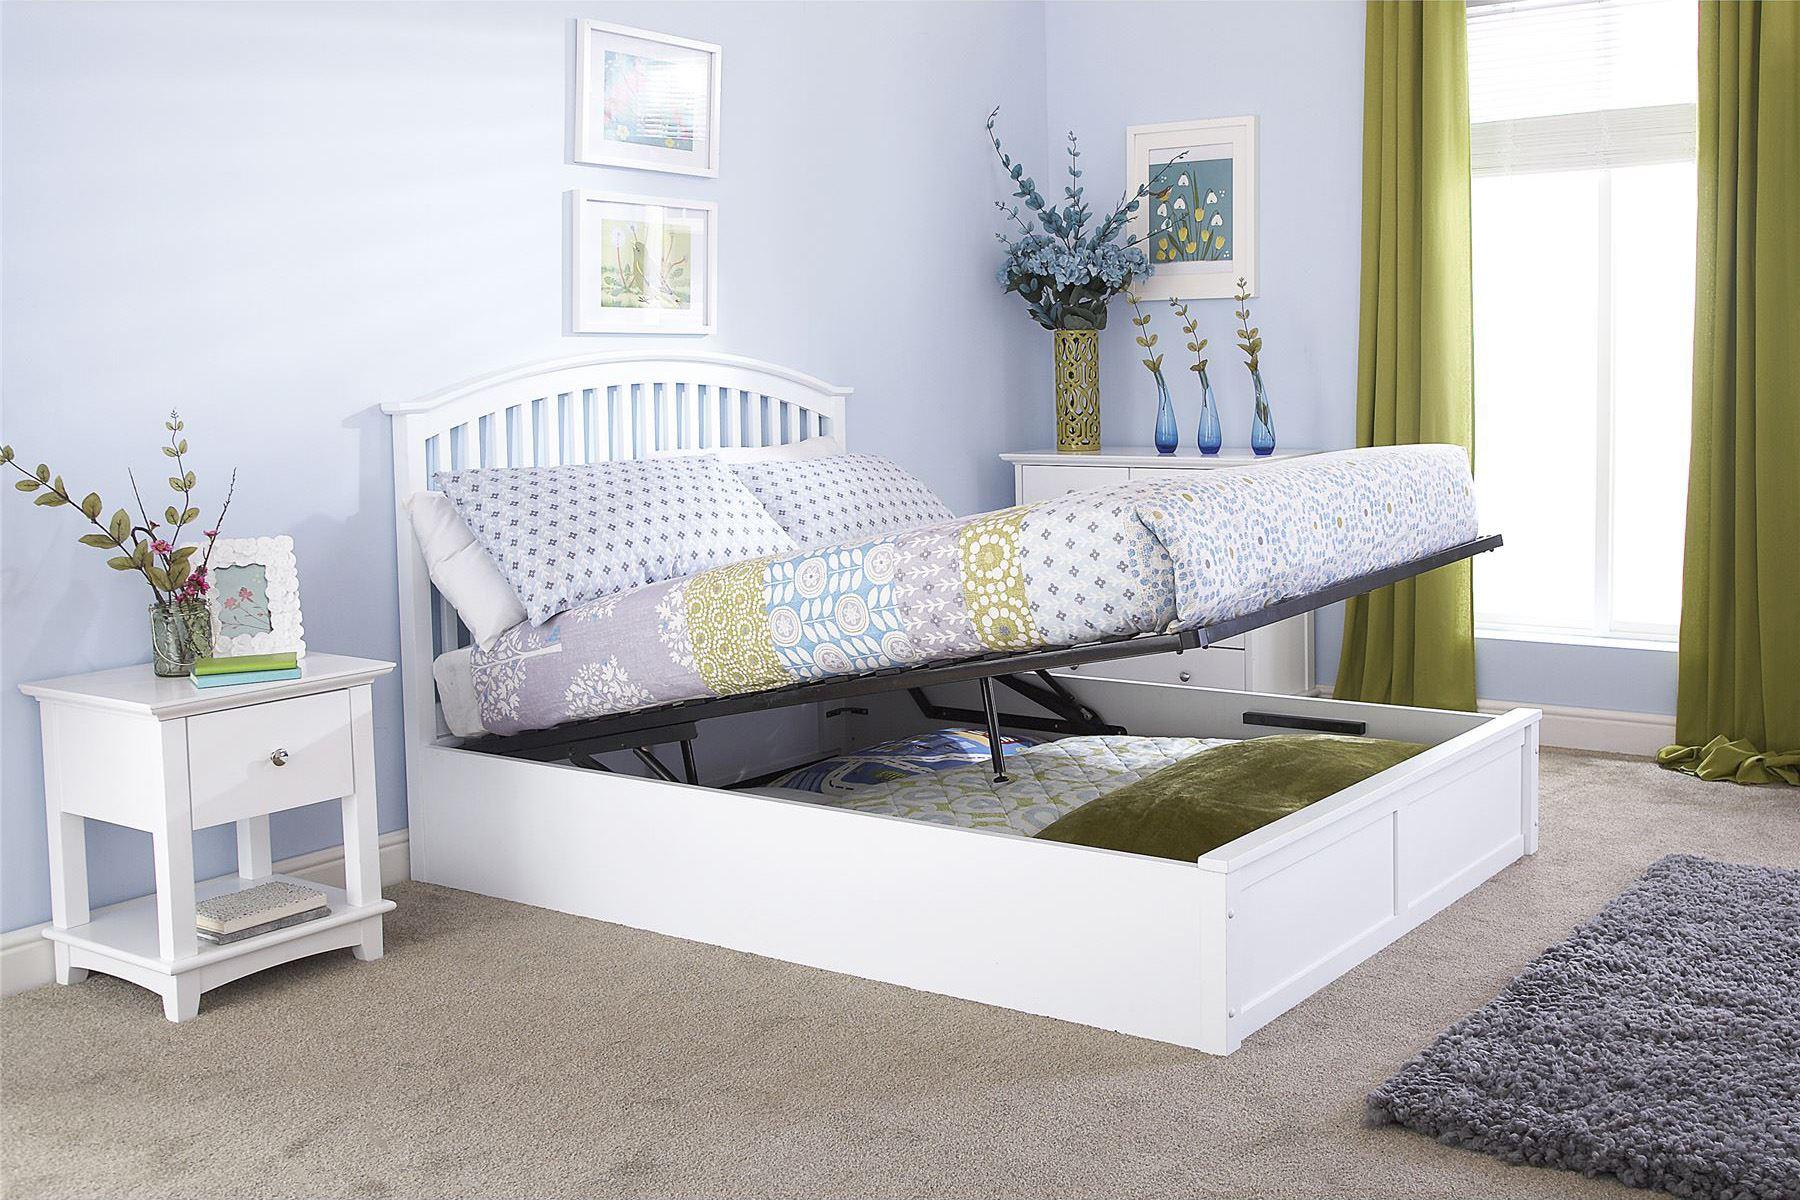 Strange Storage Ottoman Gas Lift Up Bed Frame Instructions Forskolin Free Trial Chair Design Images Forskolin Free Trialorg